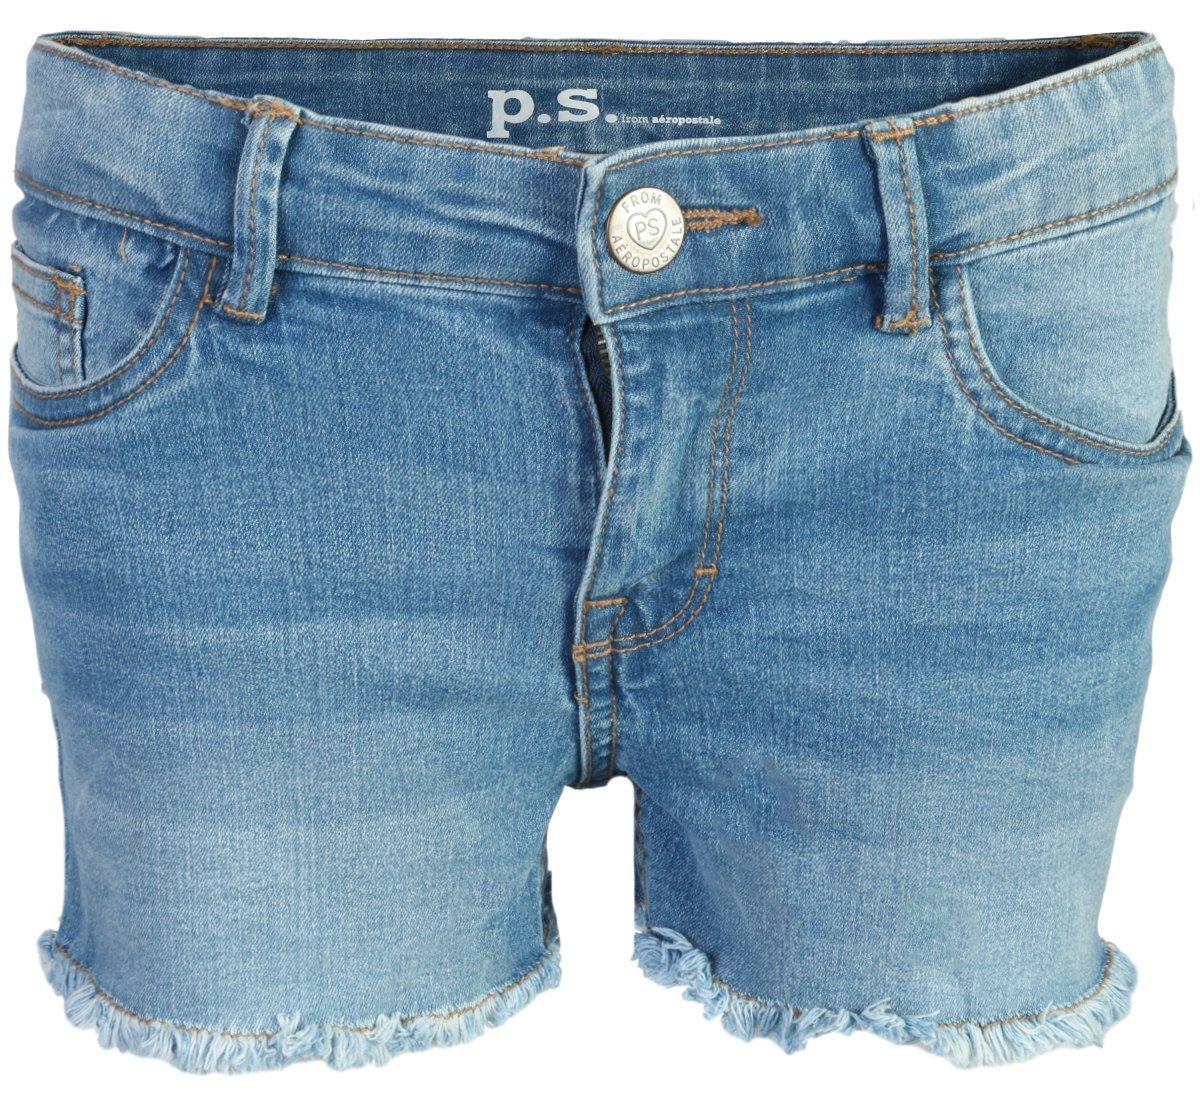 p.s. from aeropostale Girls Denim Shorts, Light Wash w/Panel, Size 10'